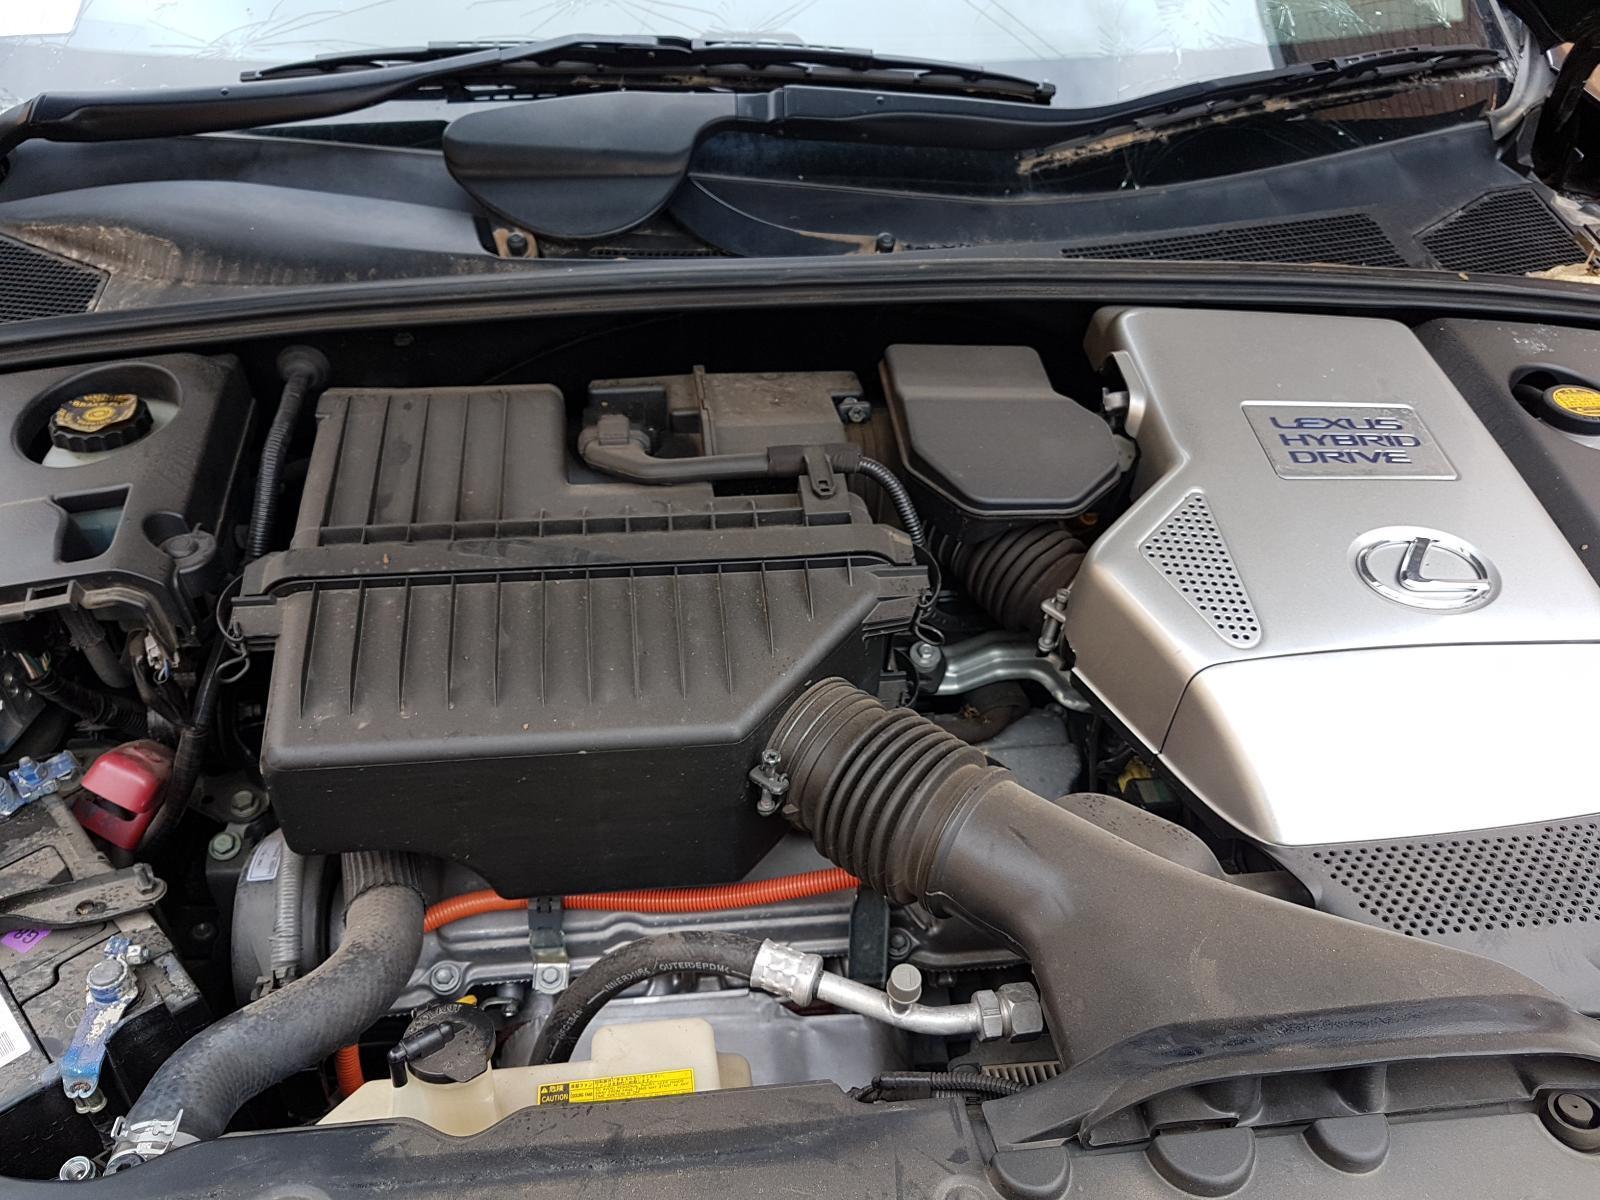 View Auto part Engine Lexus Rx Series 2008